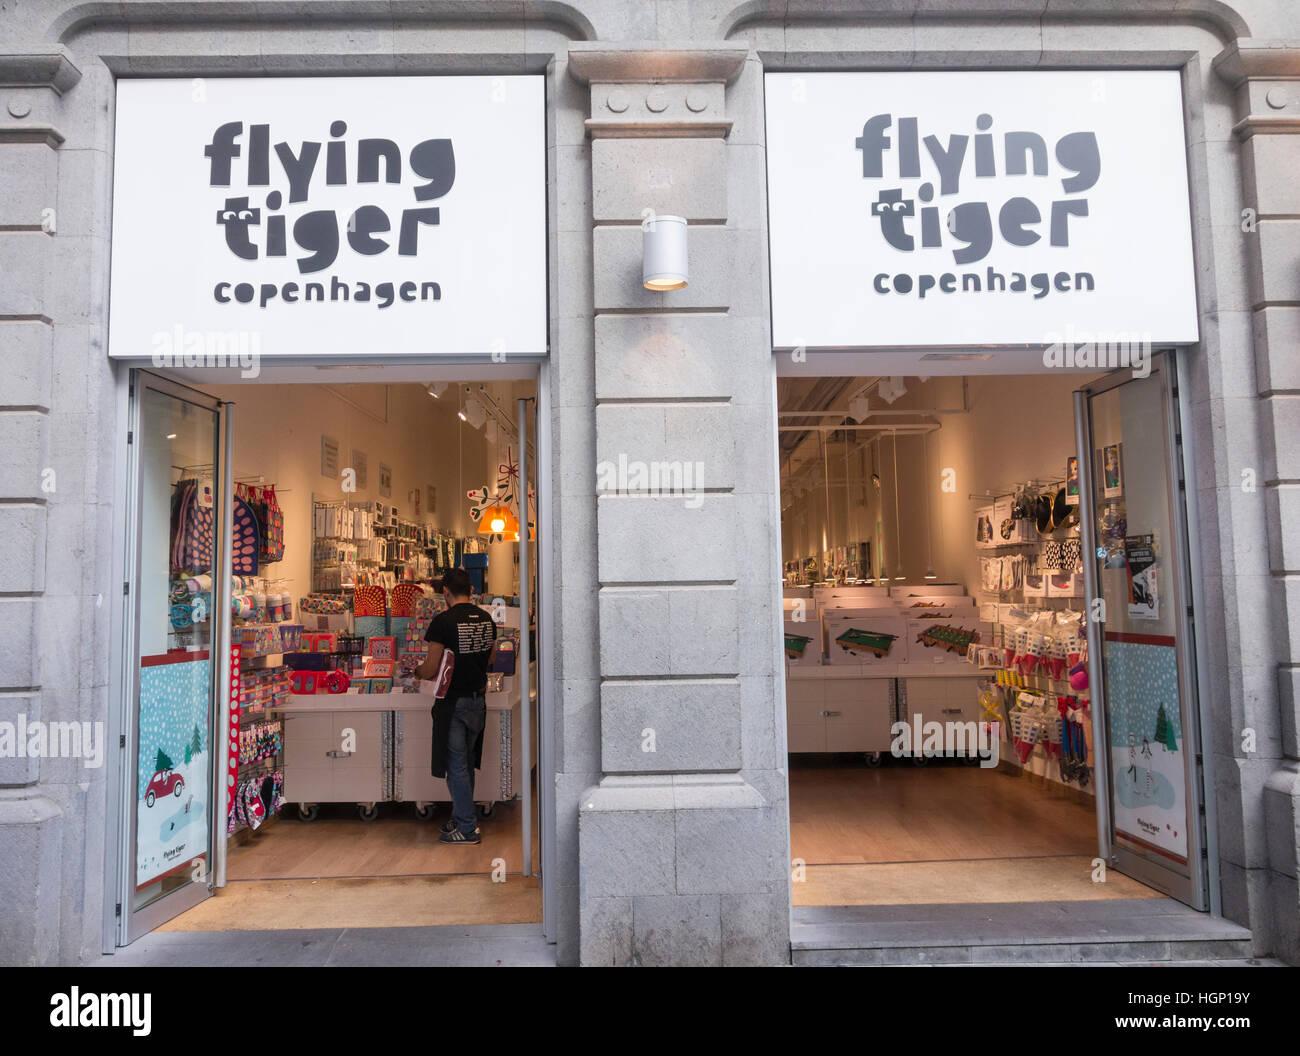 flying tiger copenhagen store in spain stock photo 130791079 alamy. Black Bedroom Furniture Sets. Home Design Ideas